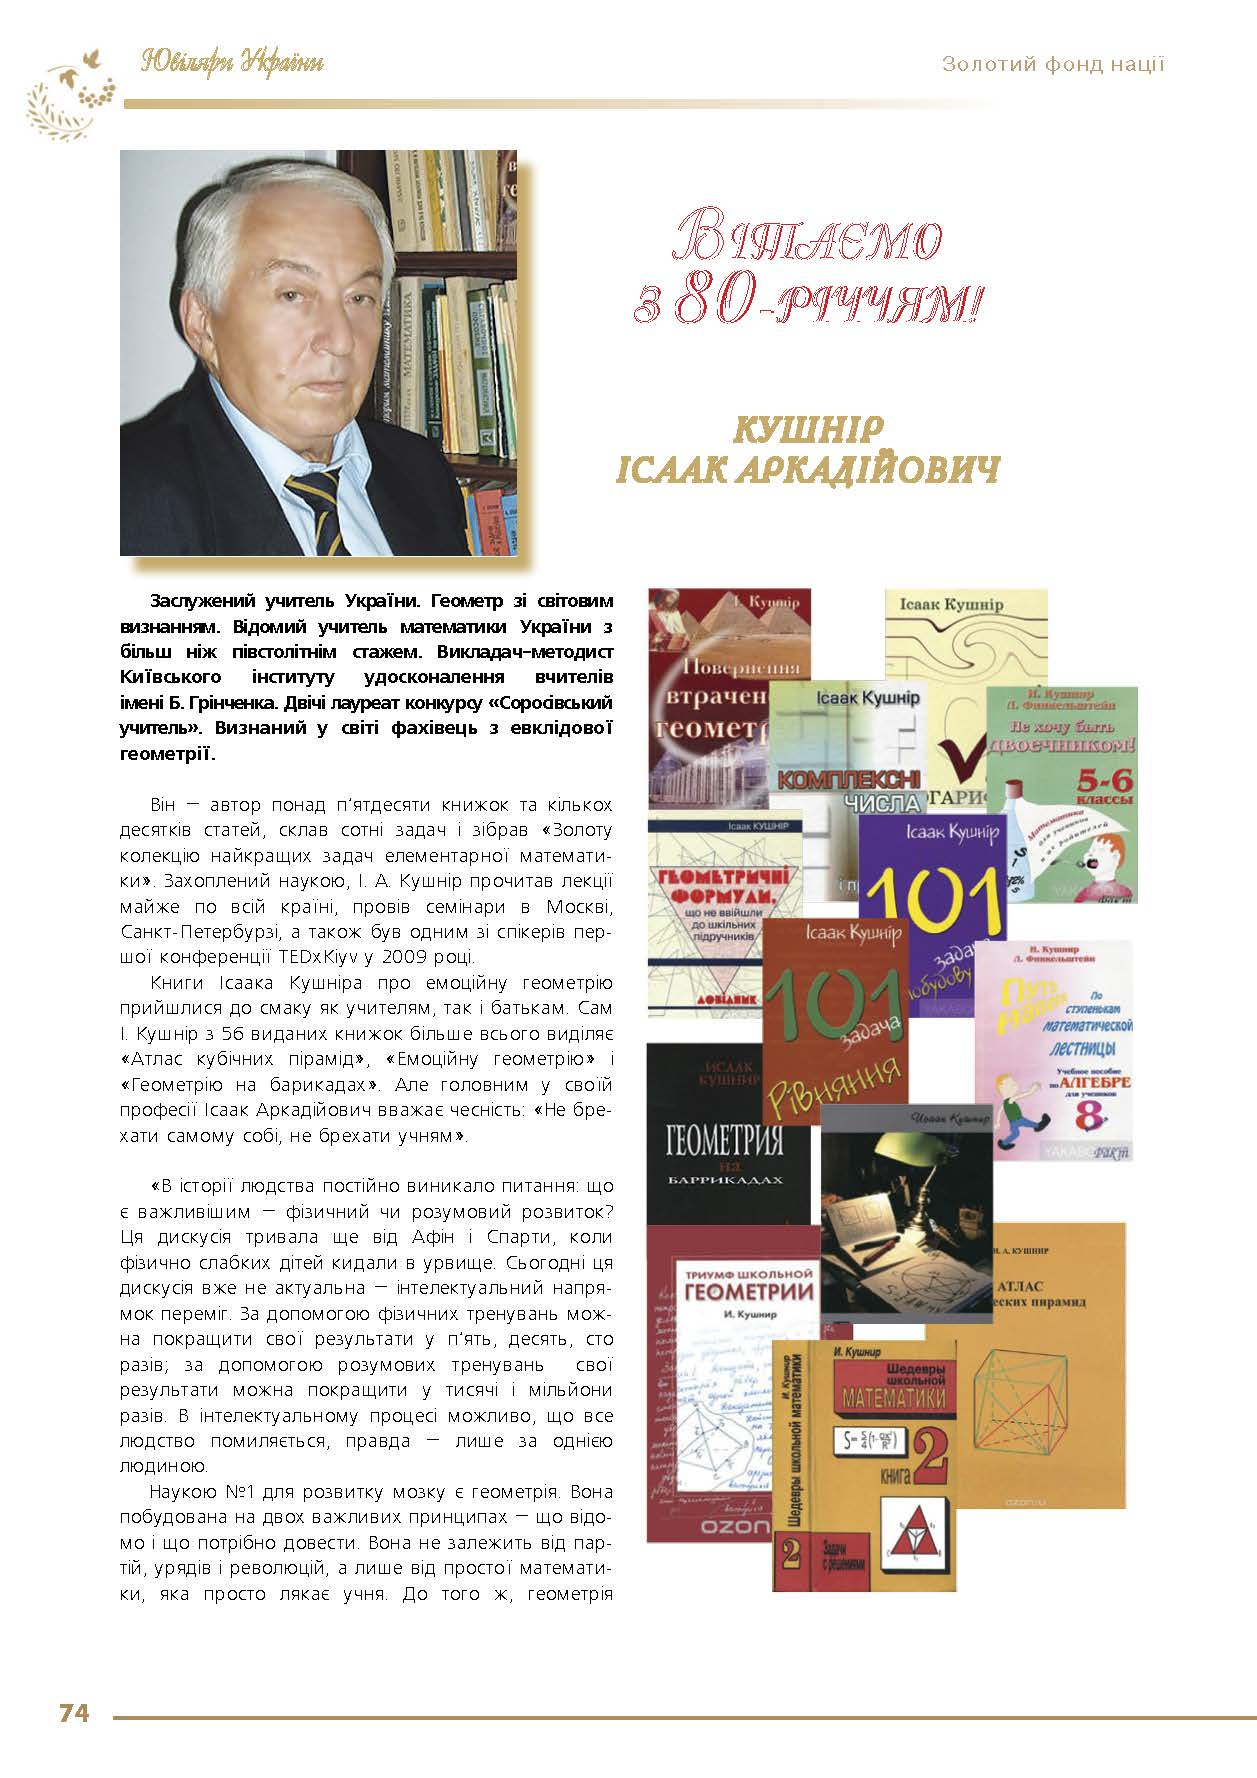 Кушнір Ісаак Аркадійович